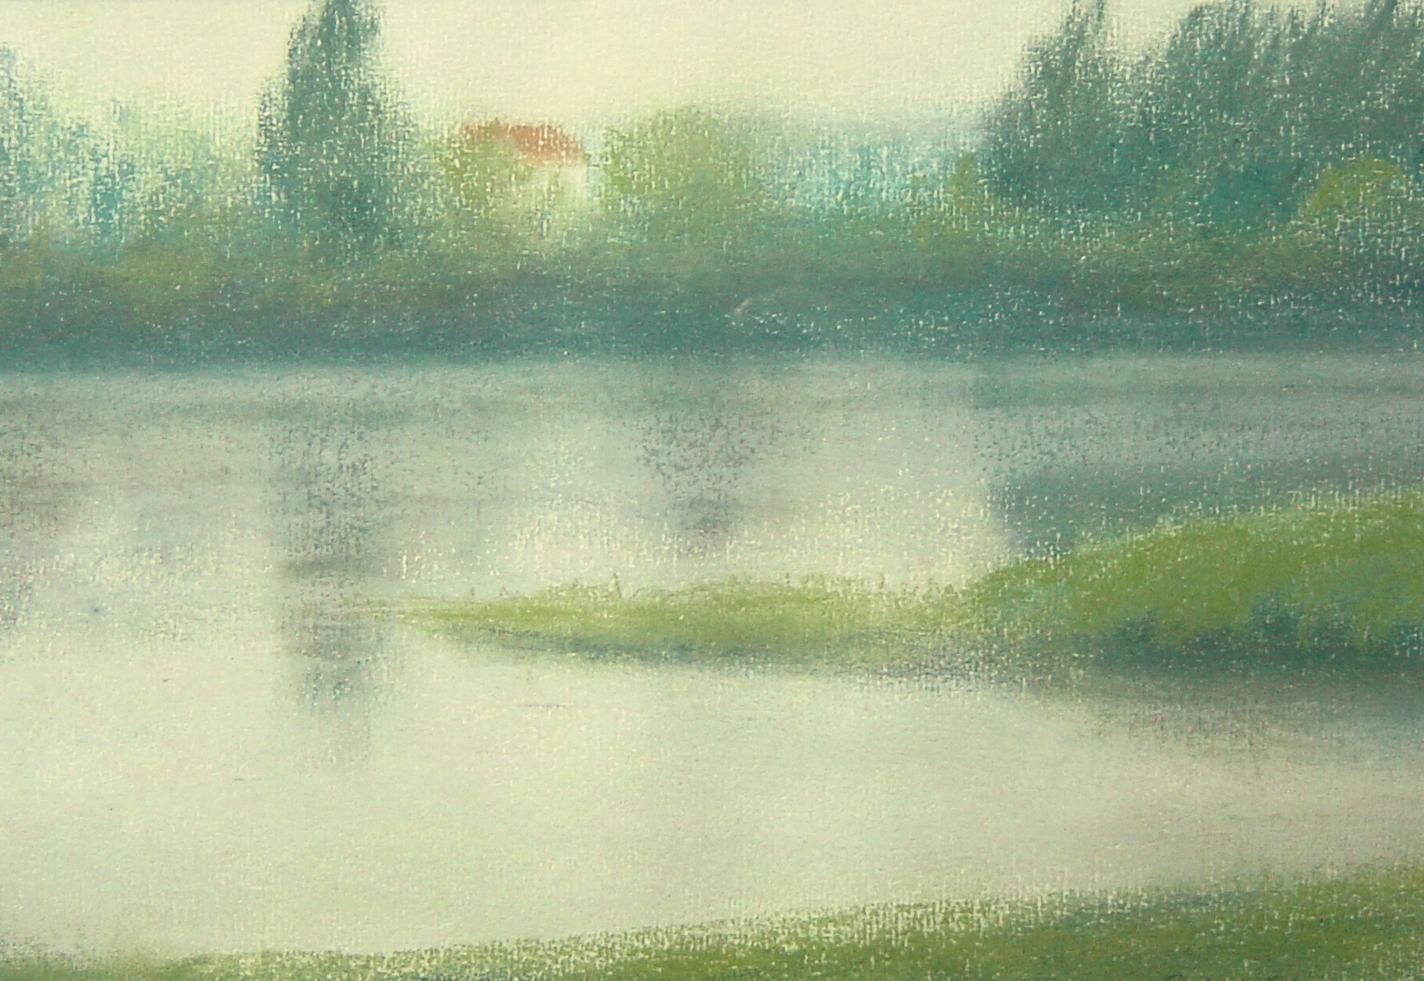 Dordogne near Bergerac